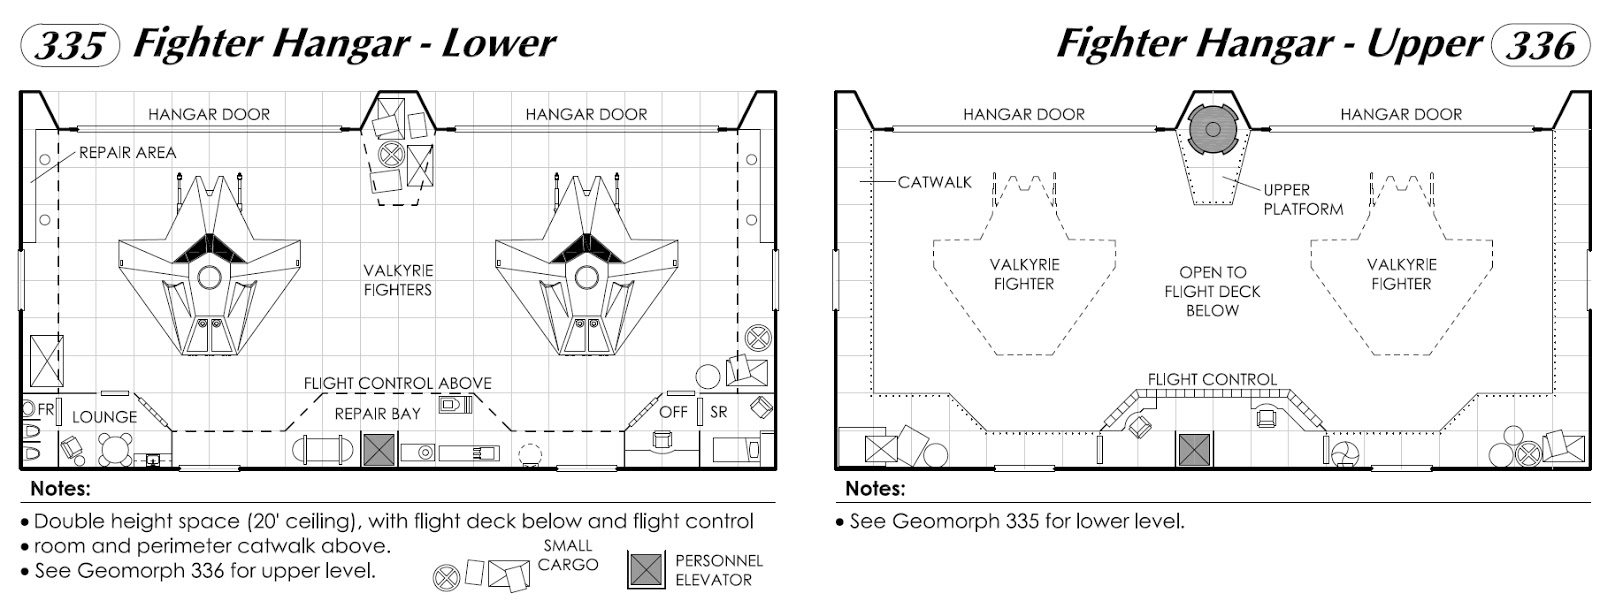 Yet another traveller blog april 2016 fighter hanger geomorph and illustrations baanklon Choice Image